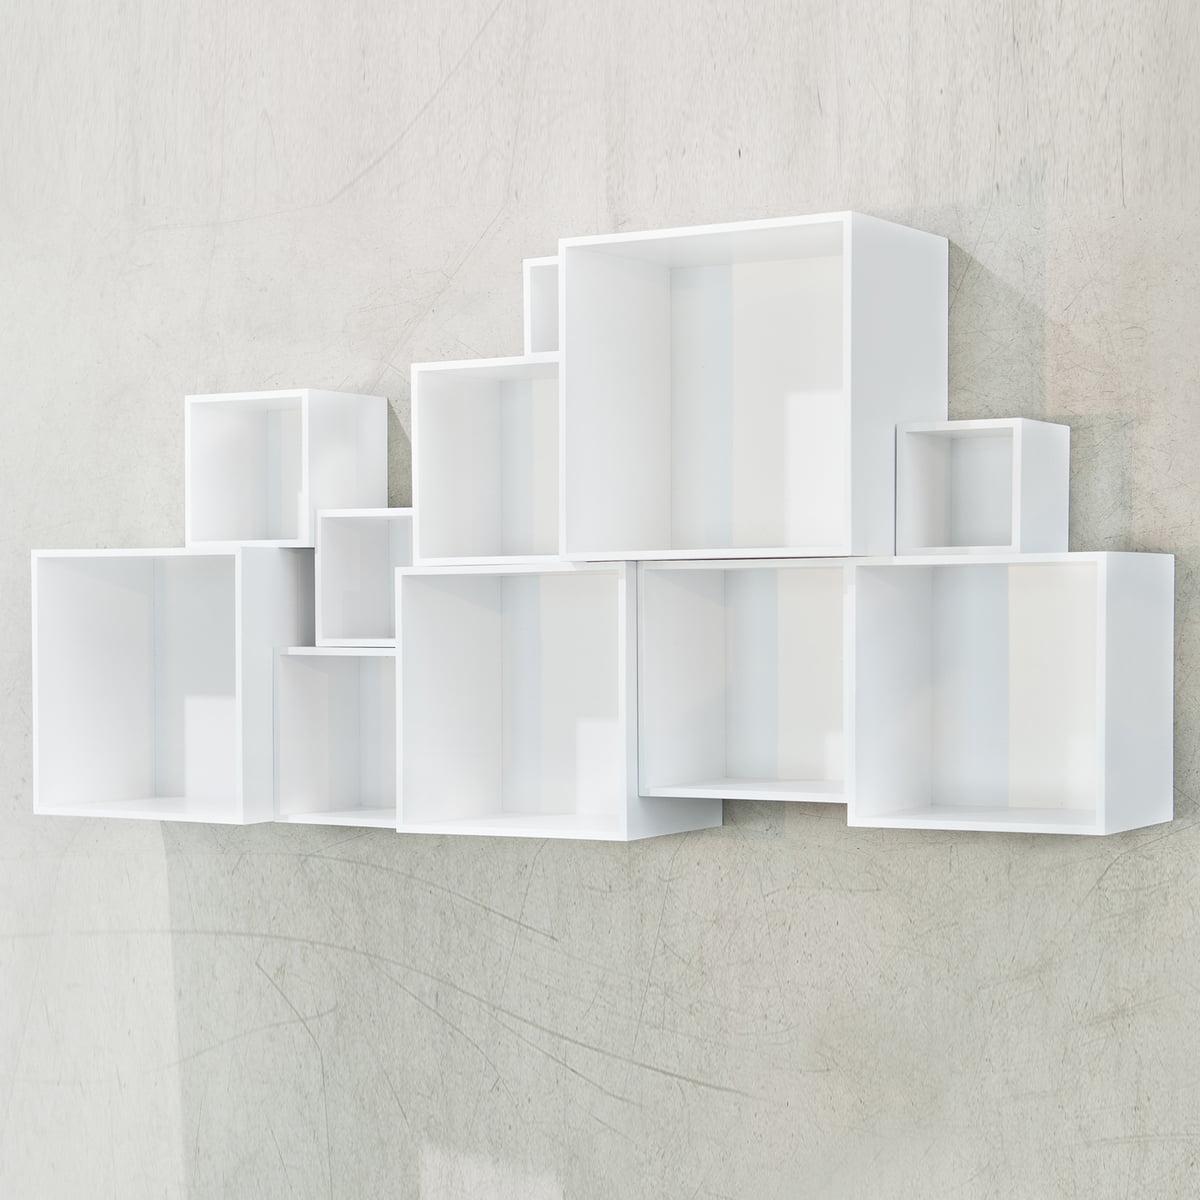 Bücherregal weiß design  OK Design Babushka Boxes Bücherregal